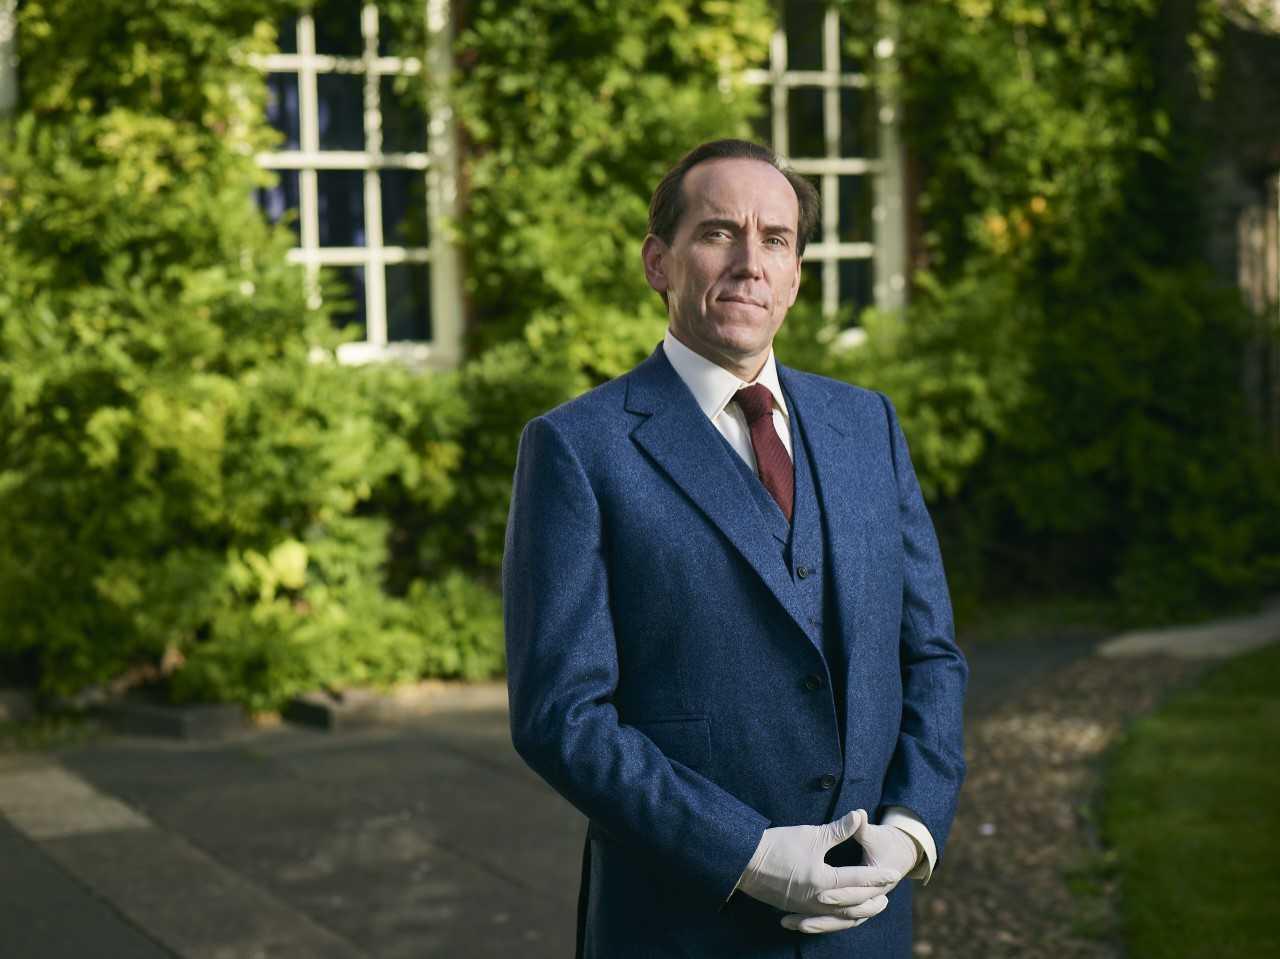 Professor T on ITV, Ben Miller